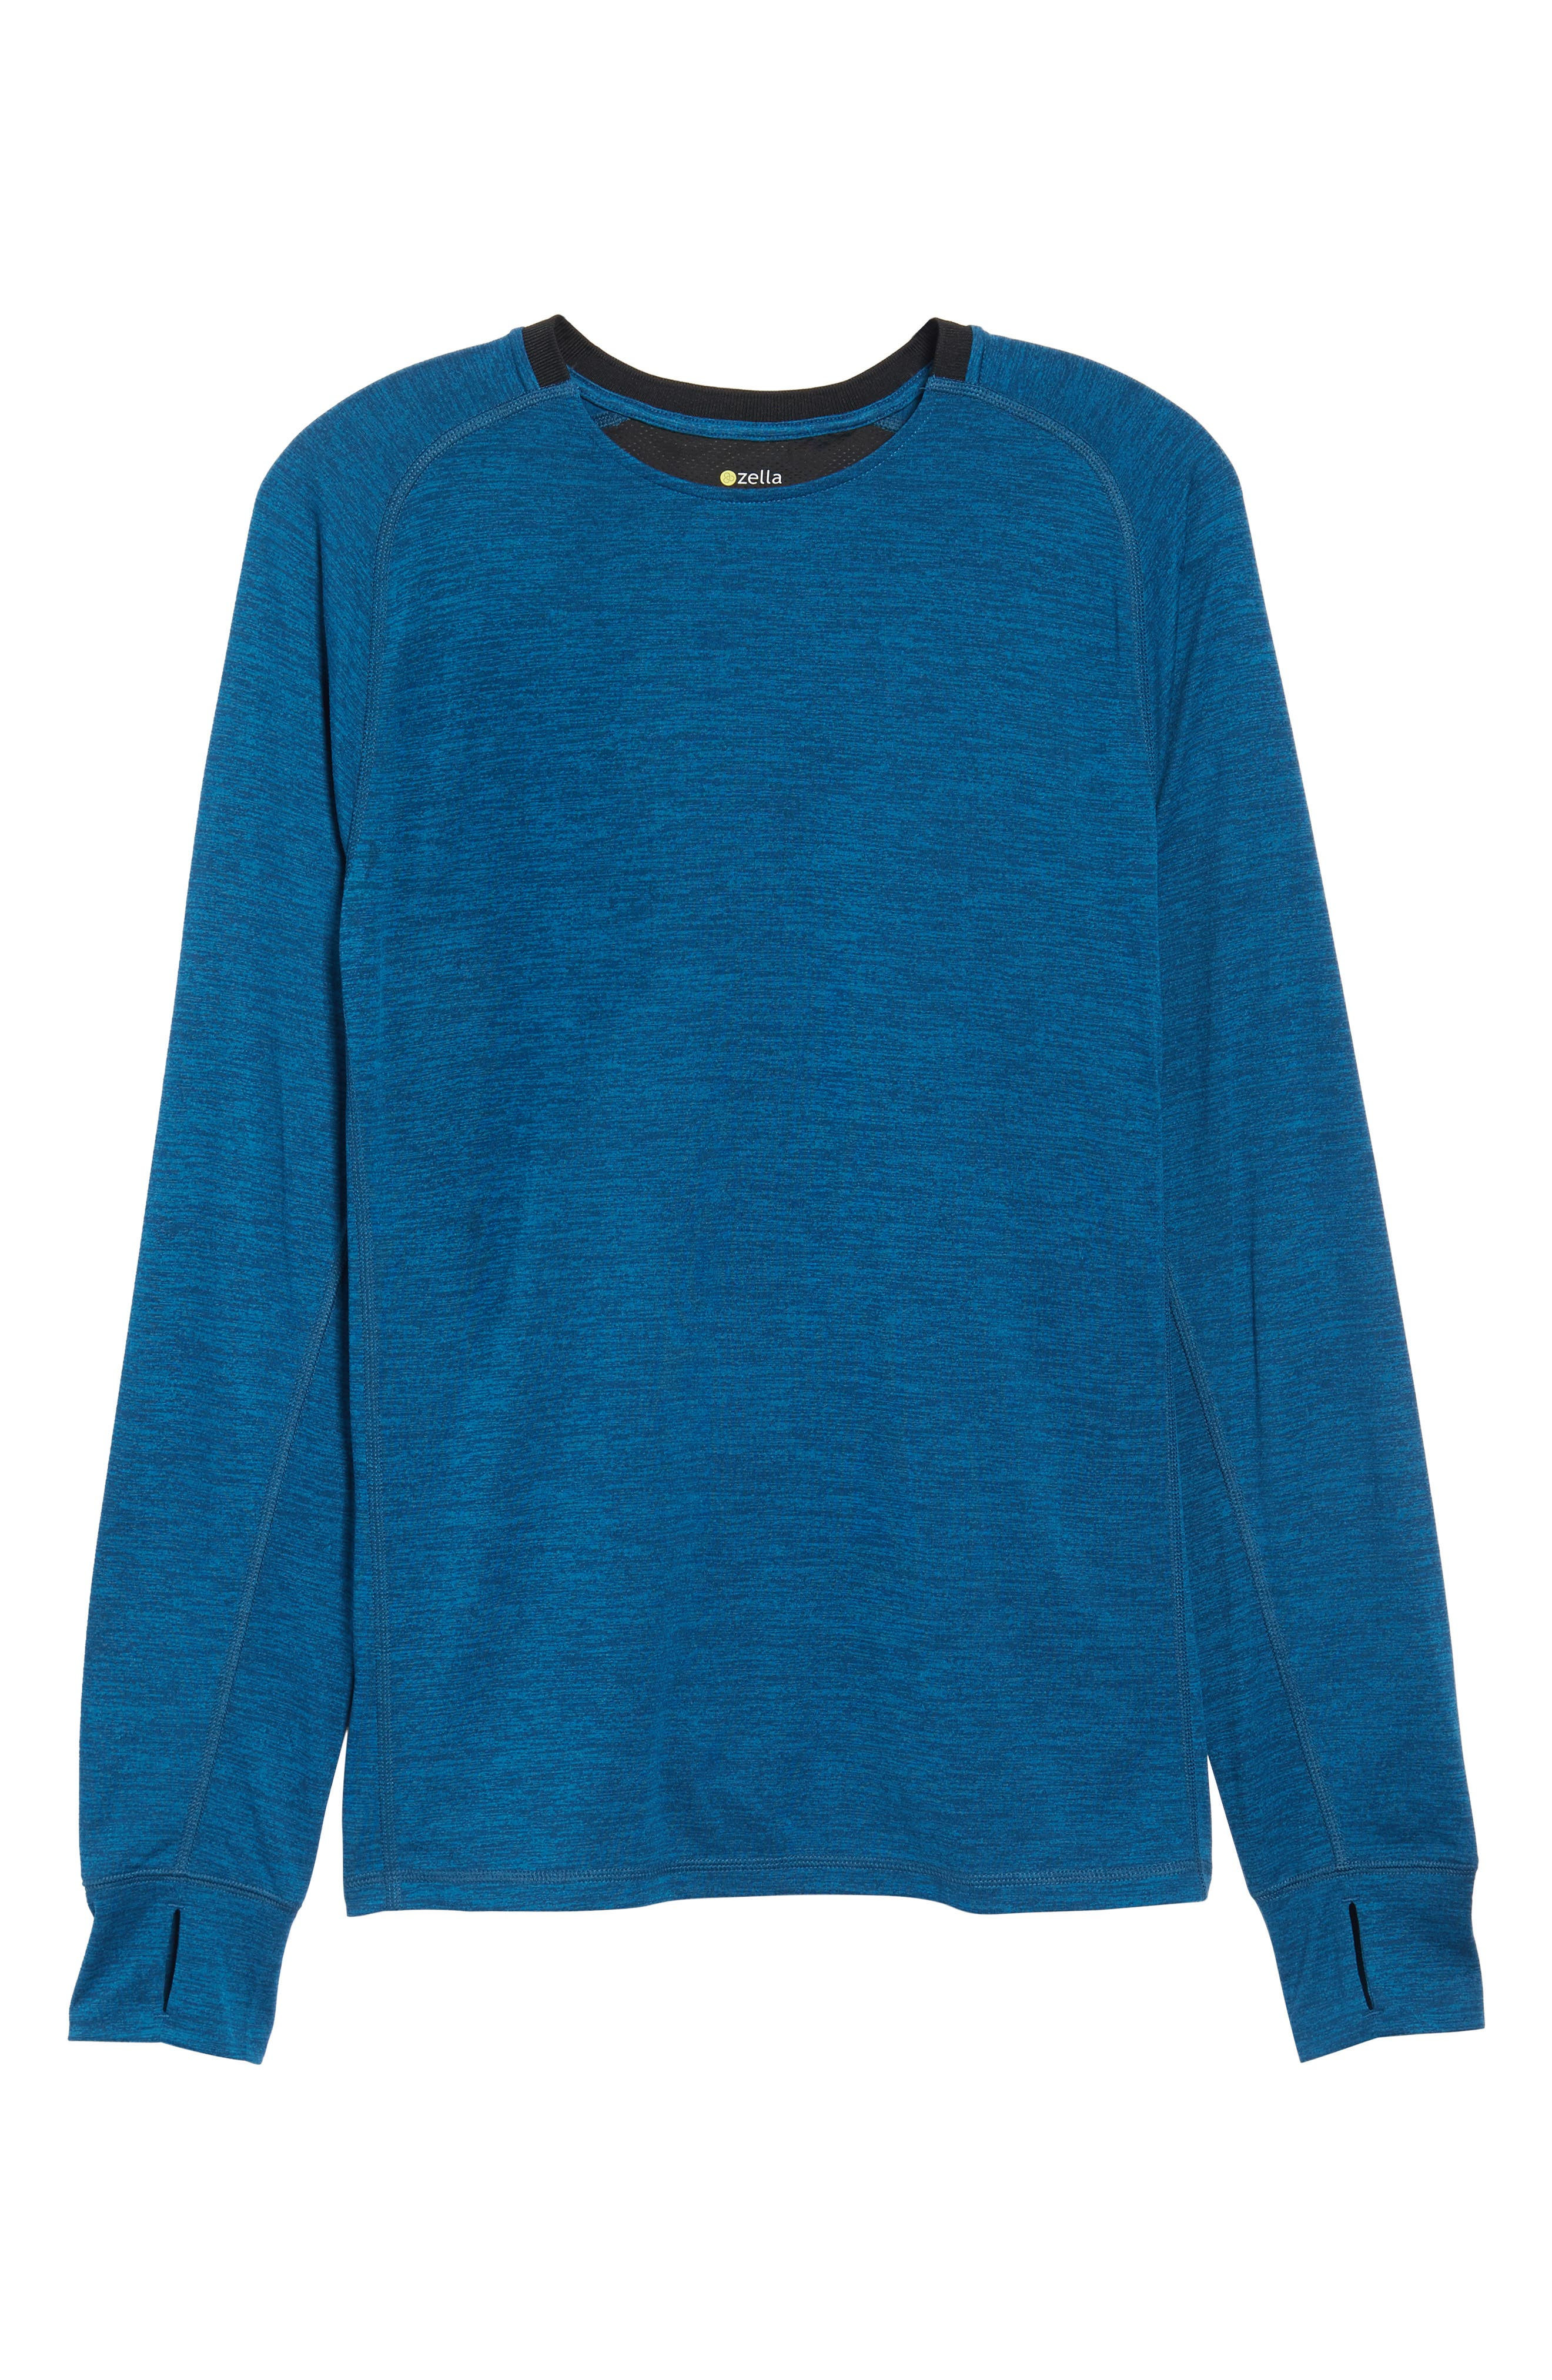 Larosite Athletic Fit T-Shirt,                             Alternate thumbnail 6, color,                             Blue Iolite Melange